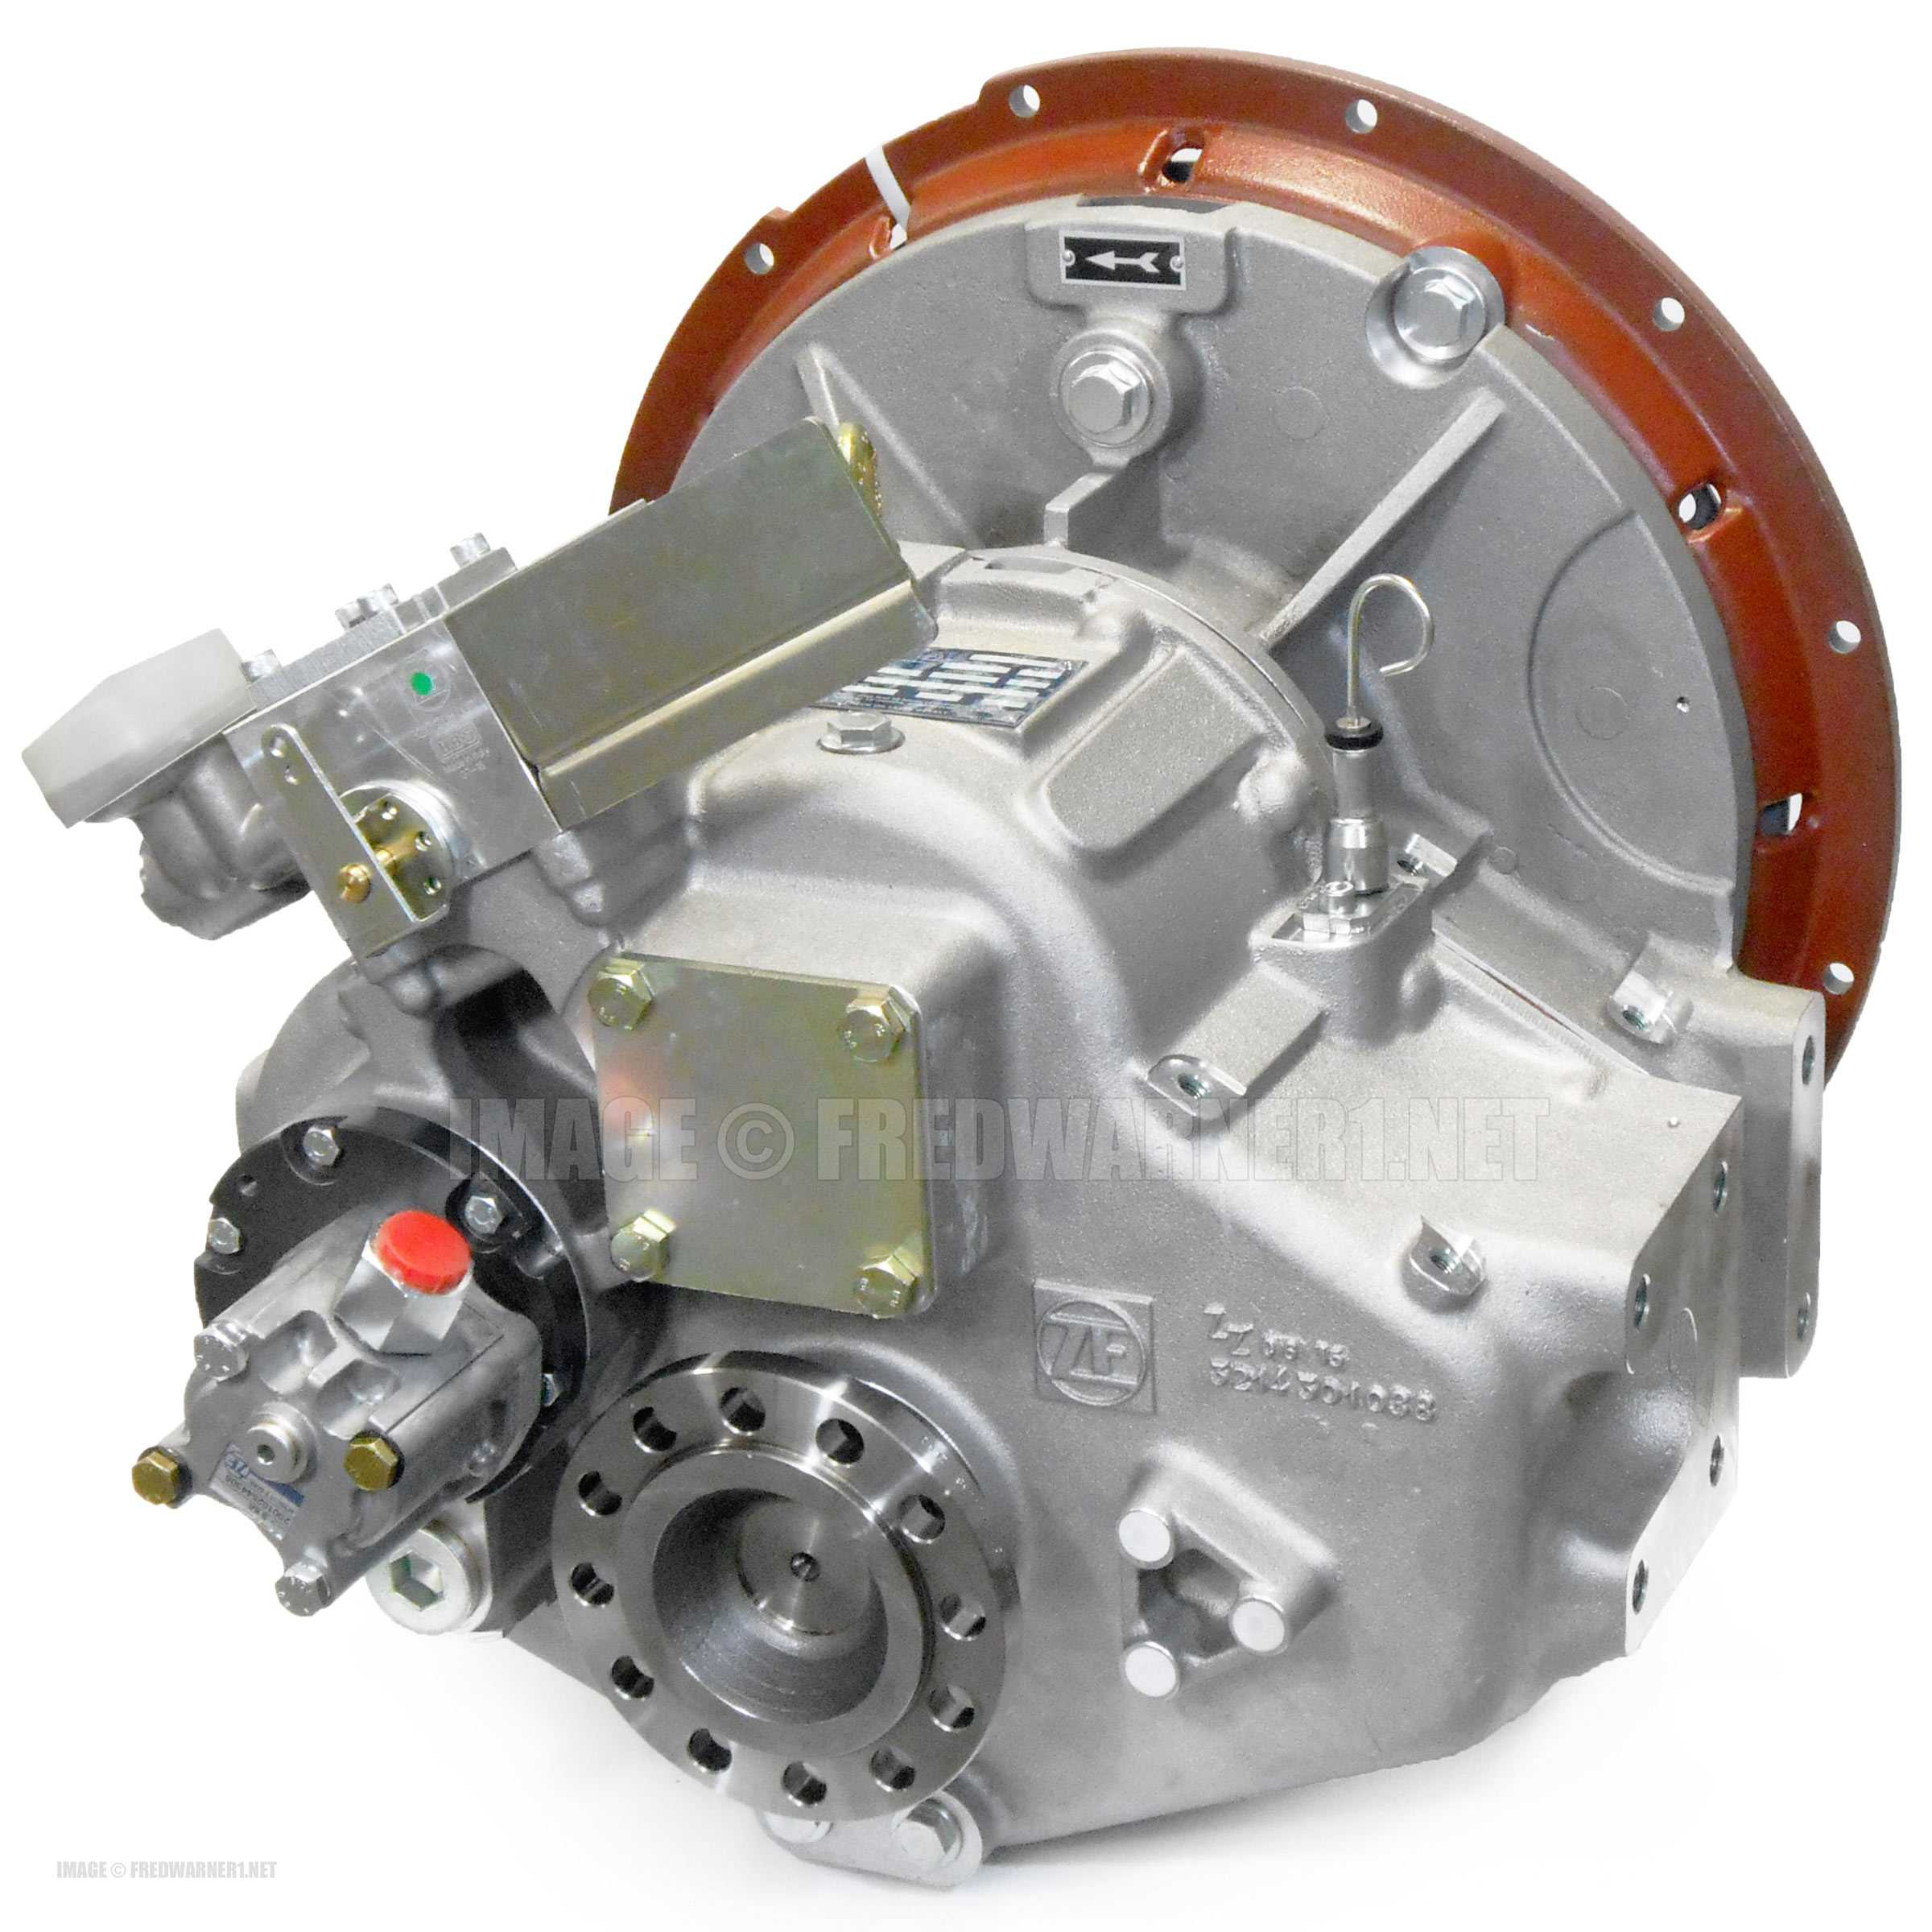 zf 325 1 marine transmission 2 957 1 mech shift vke 4011s sae 1 boat rh fredwarner1 net ZF Transmission North America Ford ZF Manual Transmission